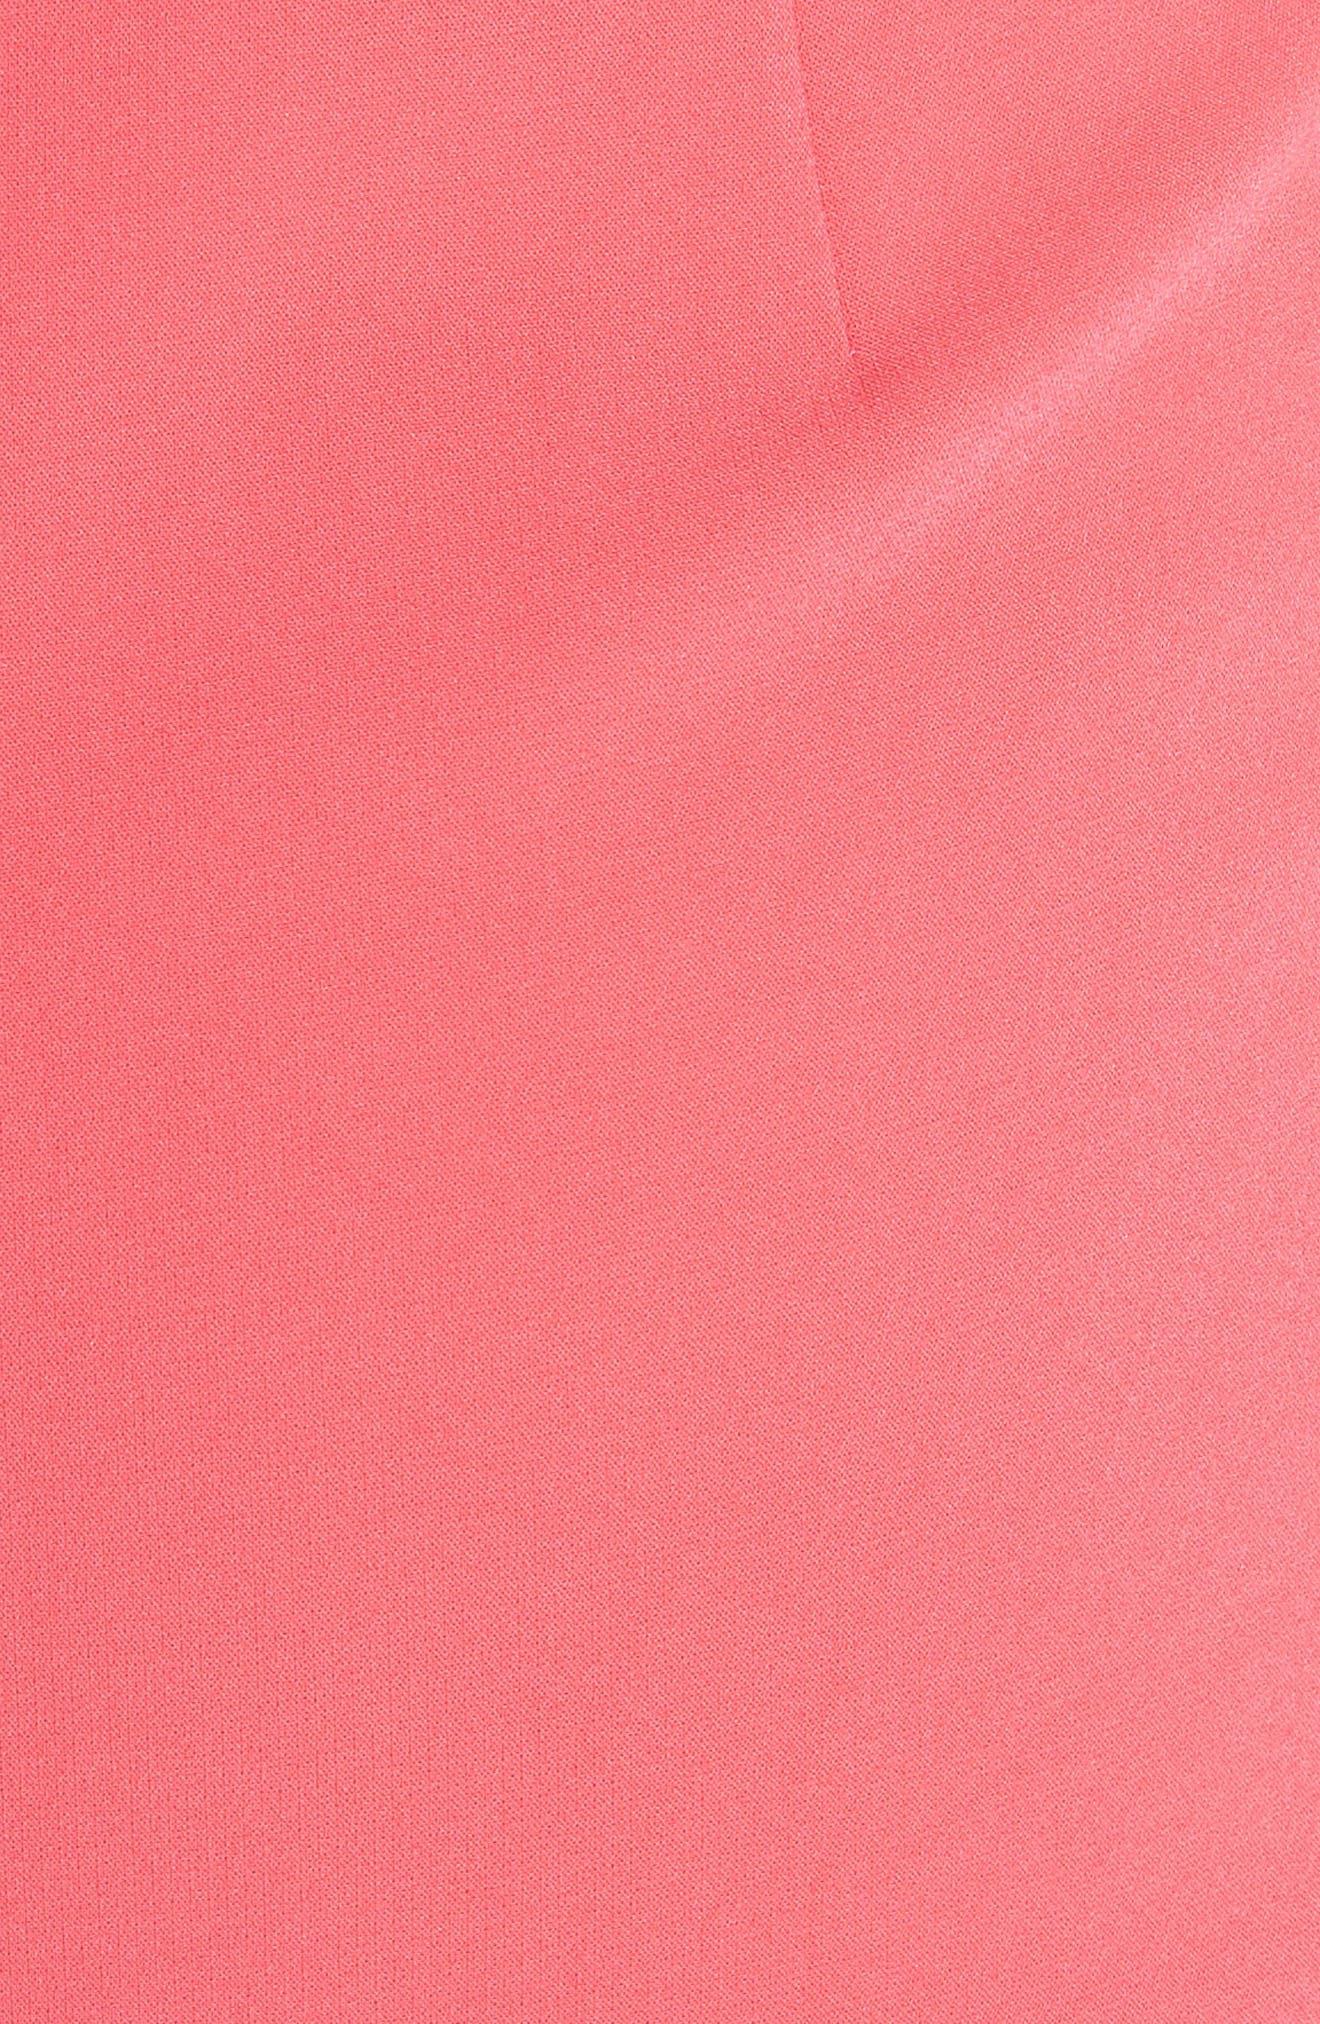 Andalasia Sleeveless Fit & Flare Dress,                             Alternate thumbnail 5, color,